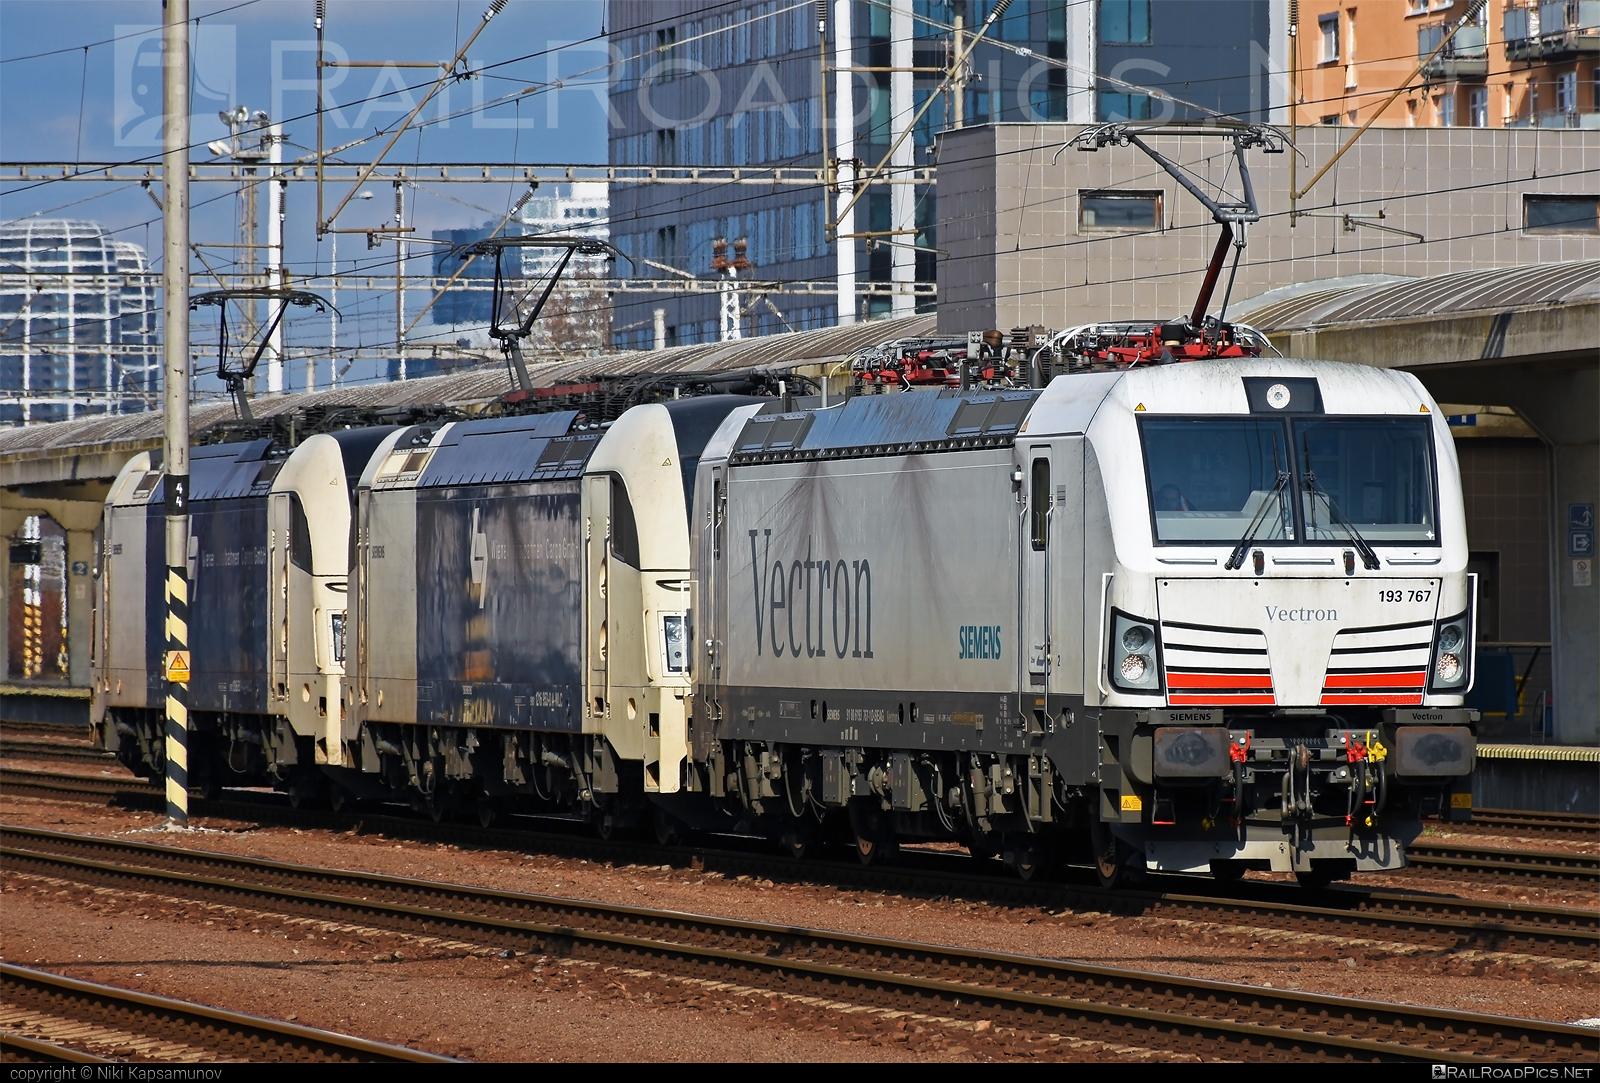 Siemens Vectron MS - 193 767 operated by Wiener Lokalbahnen Cargo GmbH #SiemensMobility #SiemensMobilityGmbH #siemens #siemensvectron #siemensvectronms #vectron #vectronms #wienerlokalbahnencargo #wienerlokalbahnencargogmbh #wlc